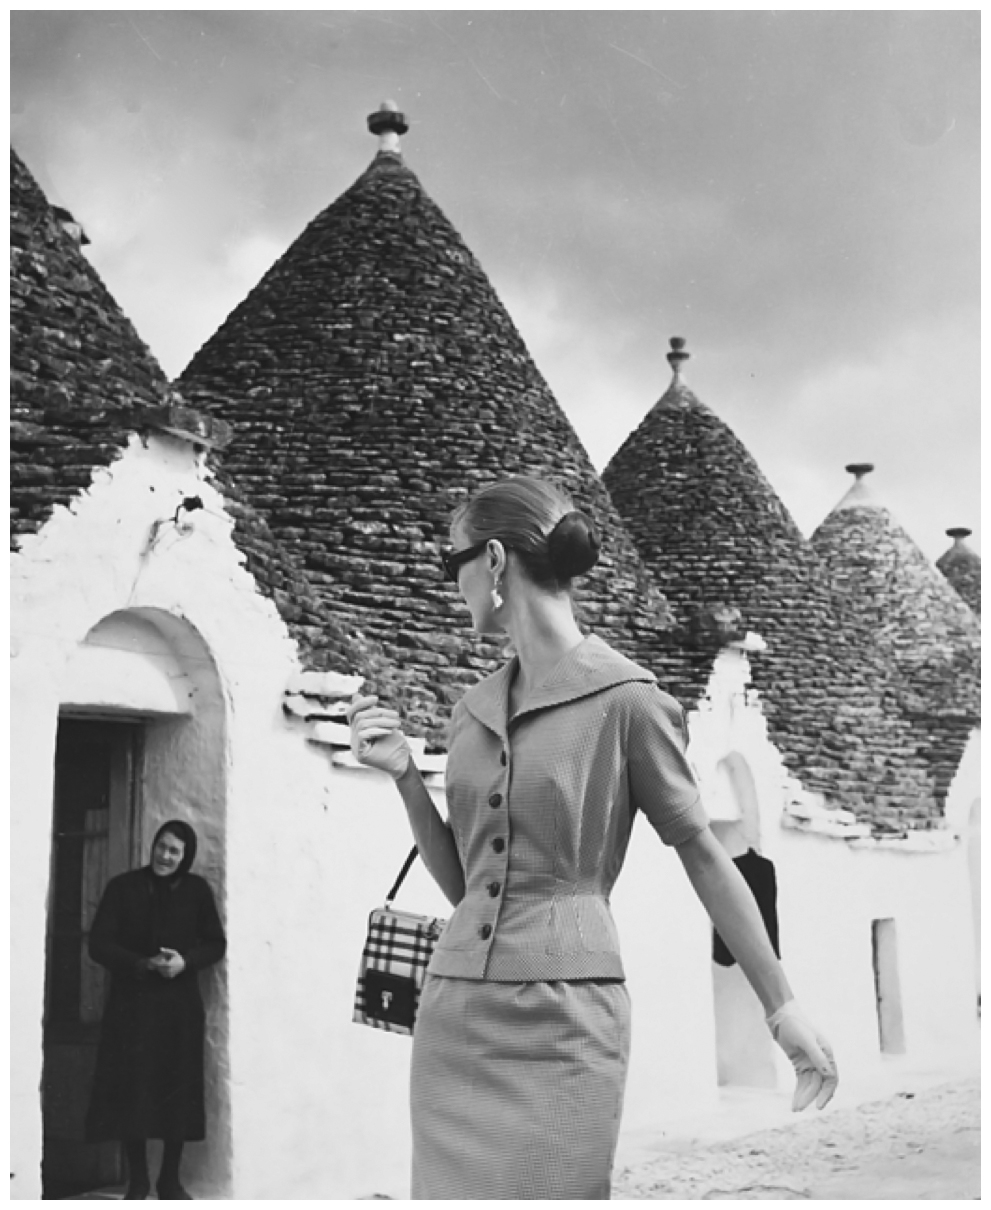 Fotó: Louise Dahl-Wolfe: Evelyn Tripp in Gjoia del Colle, Italy, 1955 © Louise Dahl-Wolfe Archive